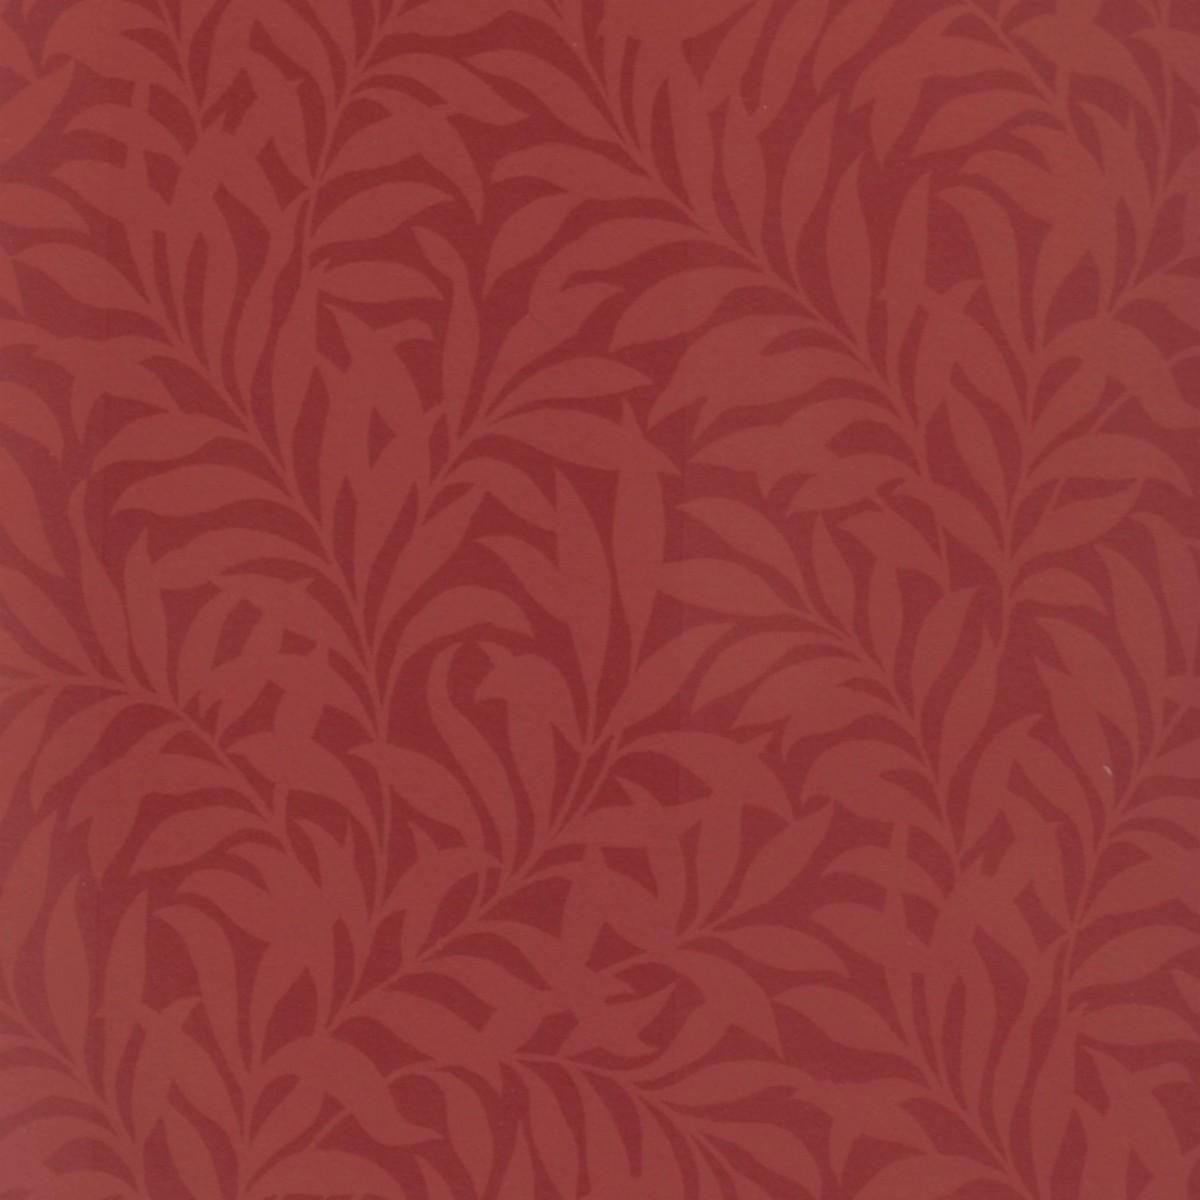 Обои бумажные Ashford House Flowers Special Edition красные 0.70 м DL0704